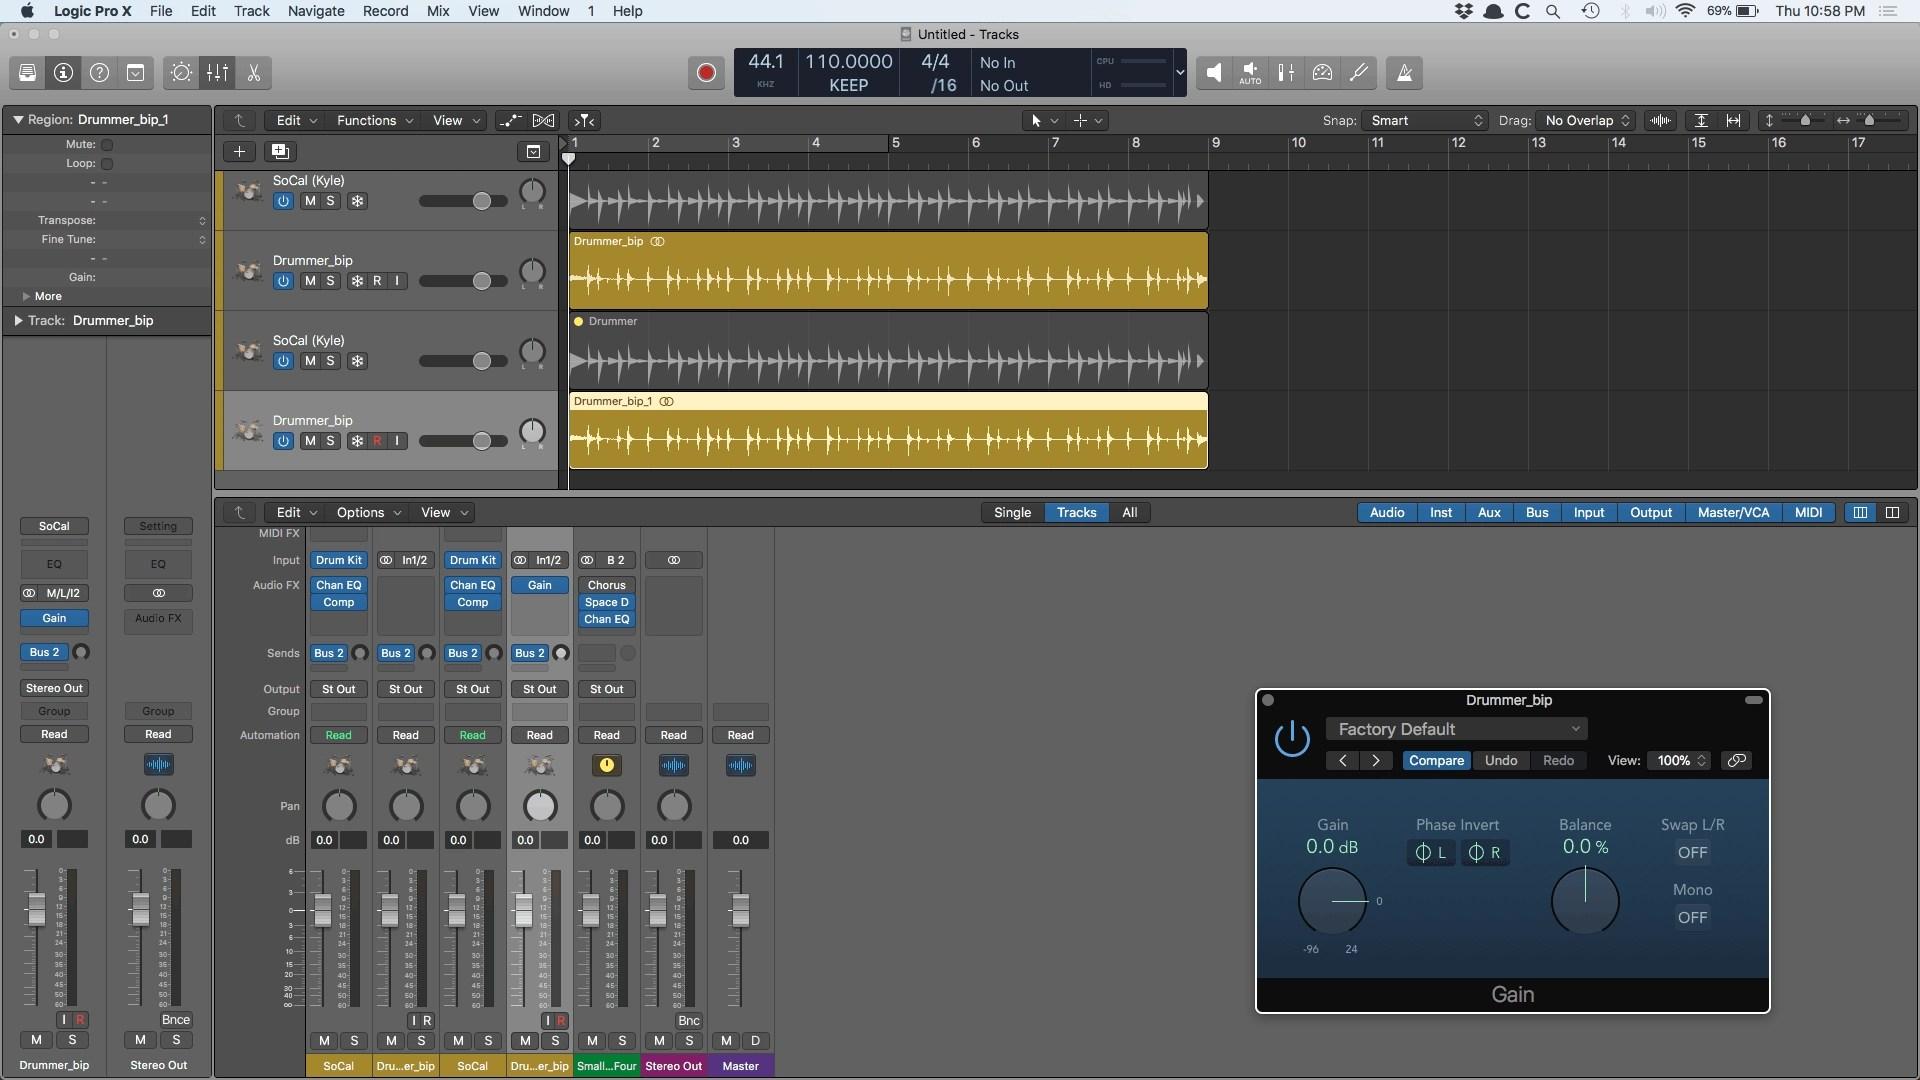 Logic Pro X Drummer Bounce in Place Gain Plugin